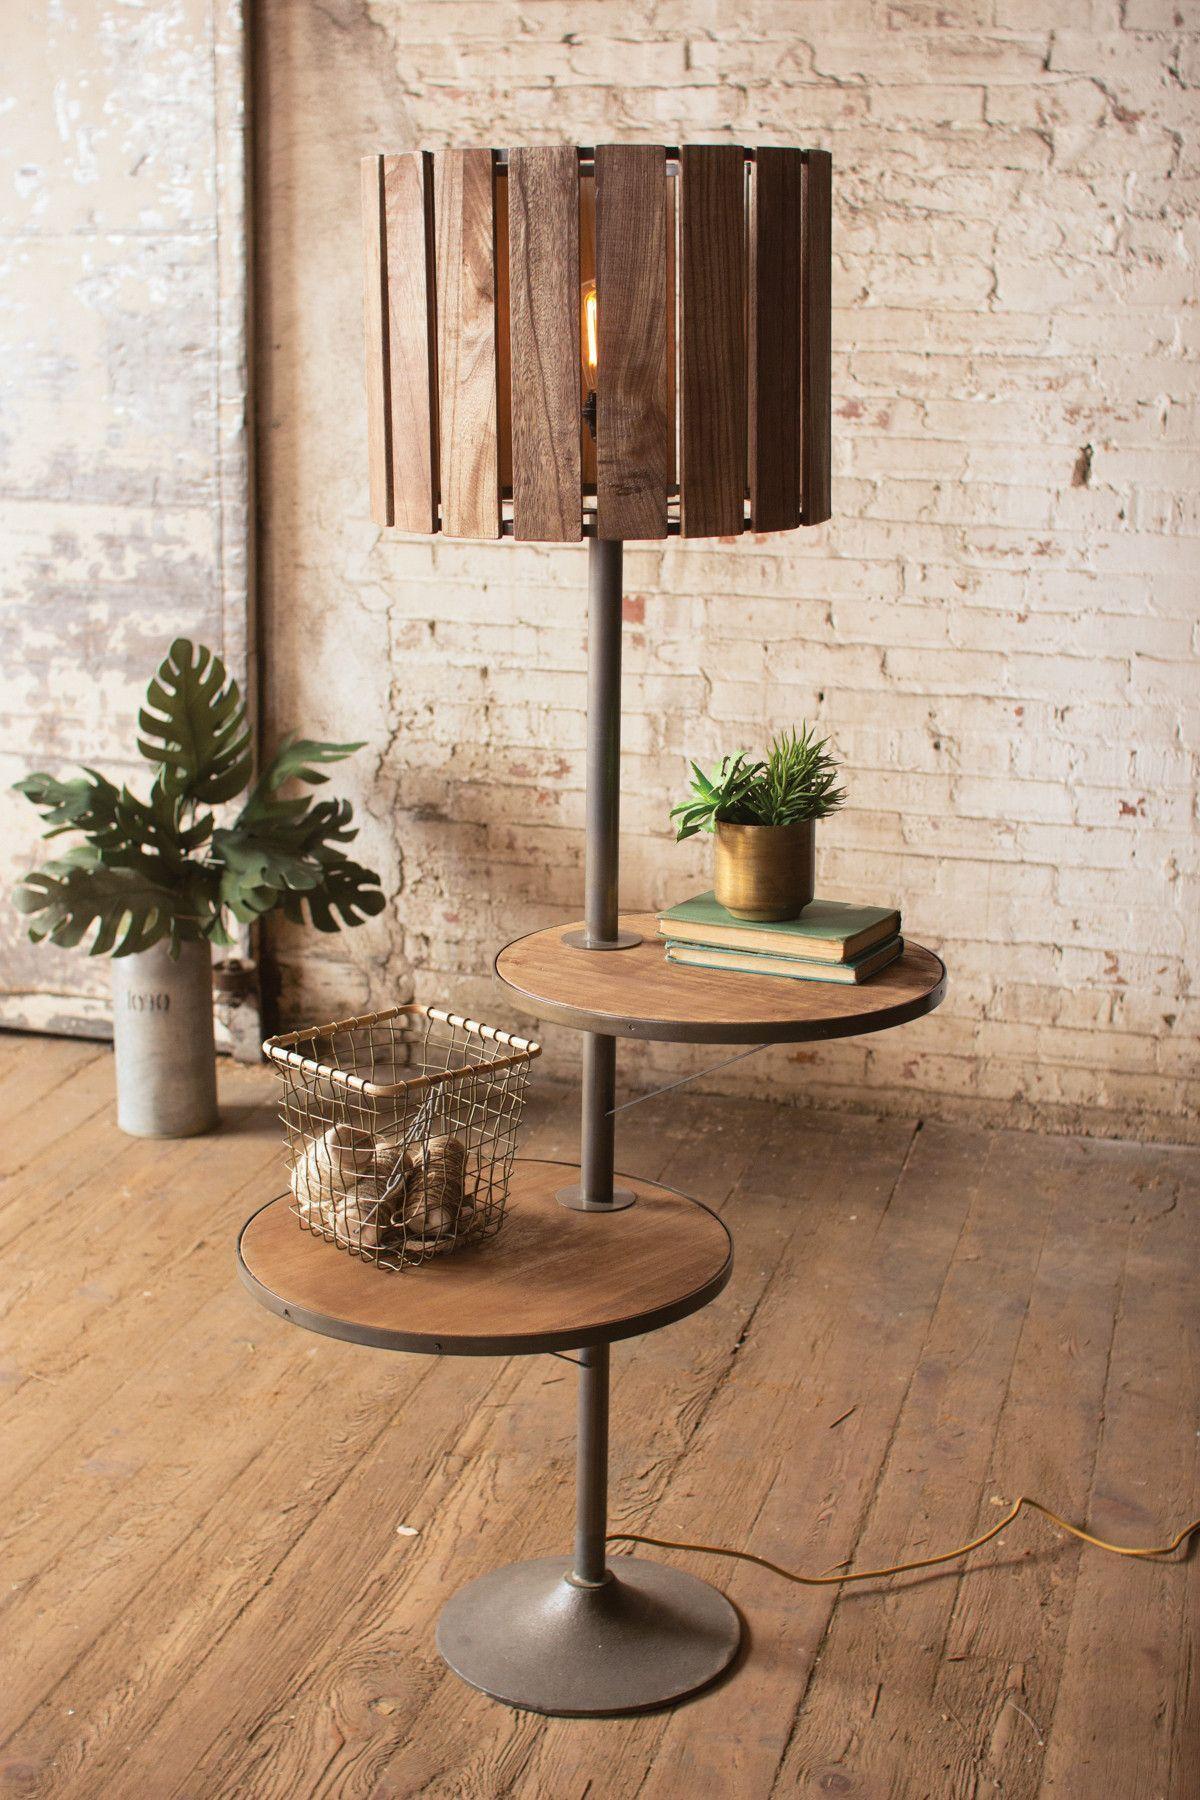 Kalalou Wood and Metal Floor Lamp with Rotating Shelves